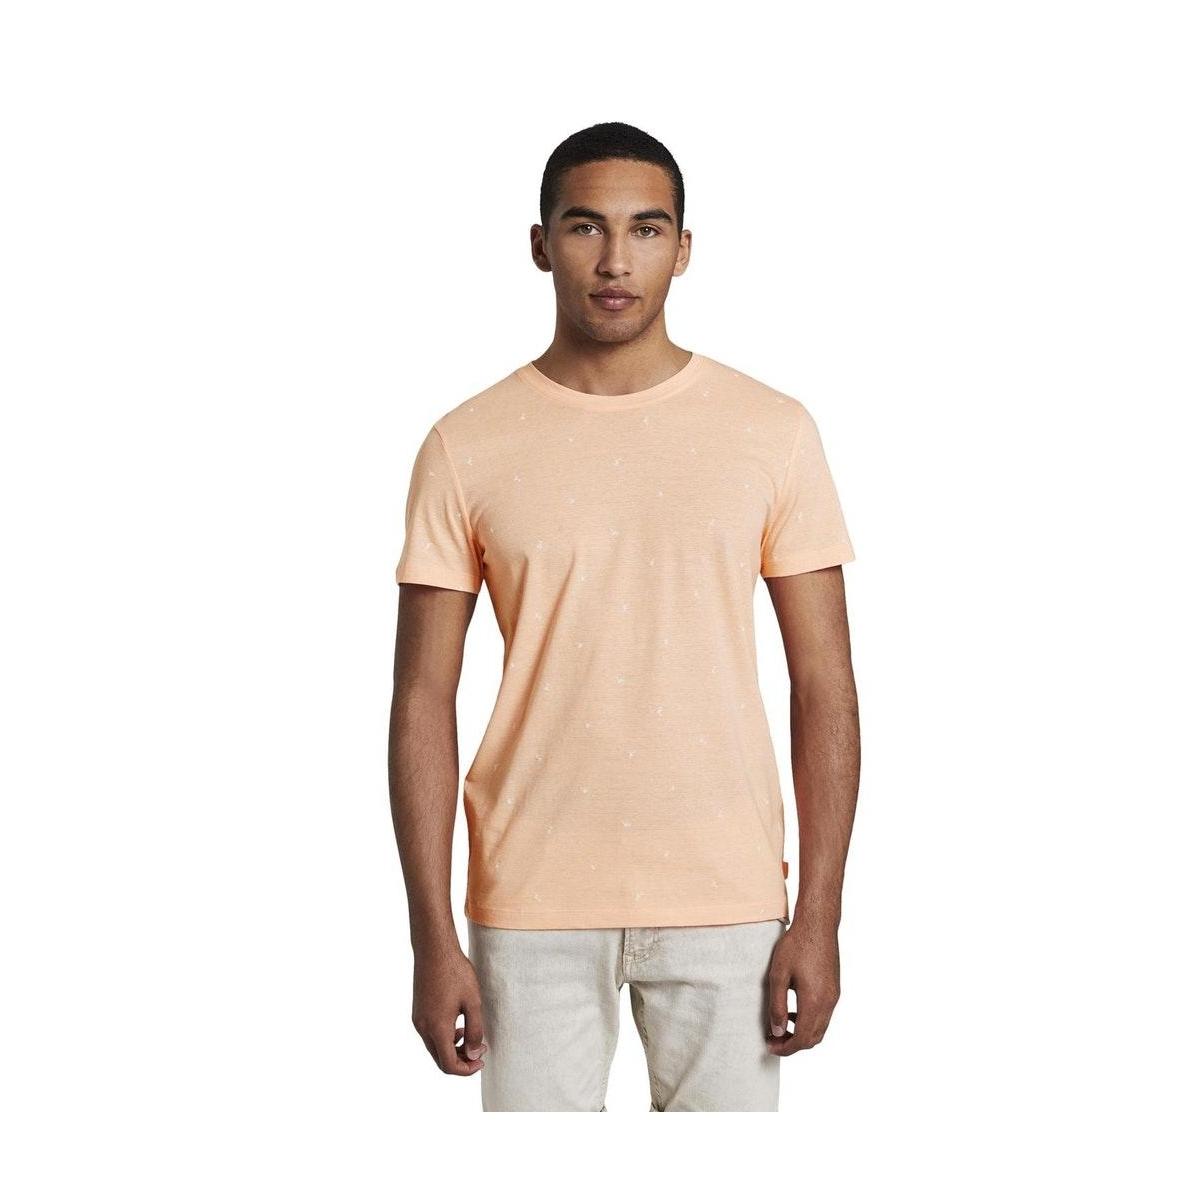 t shirt met allover print 1019088xx12 tom tailor t-shirt 23118